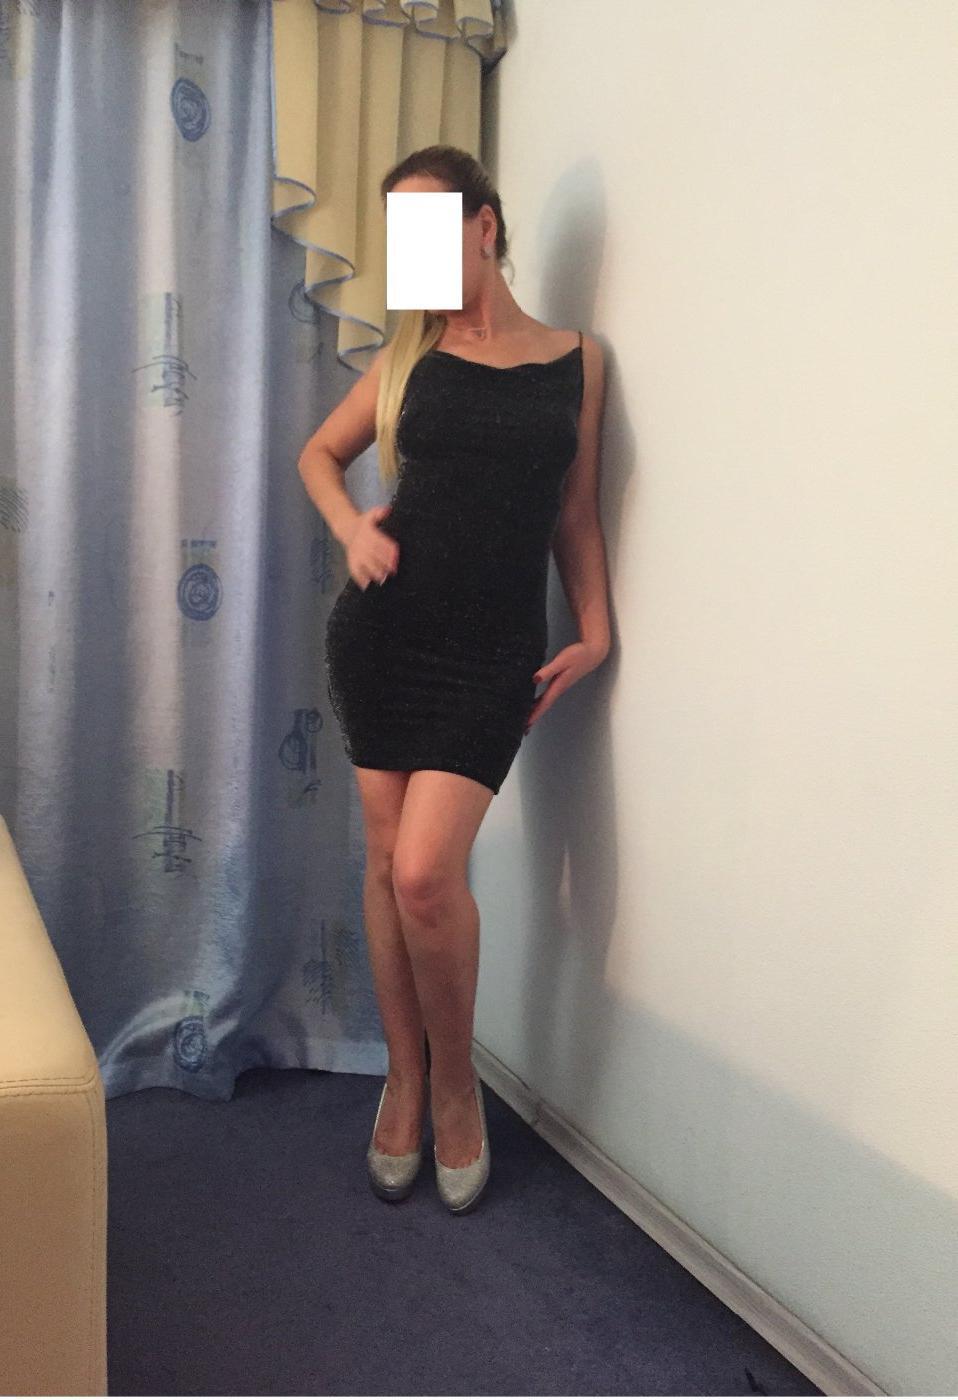 Проститутка СКАЗКА, 19 лет, метро Динамо